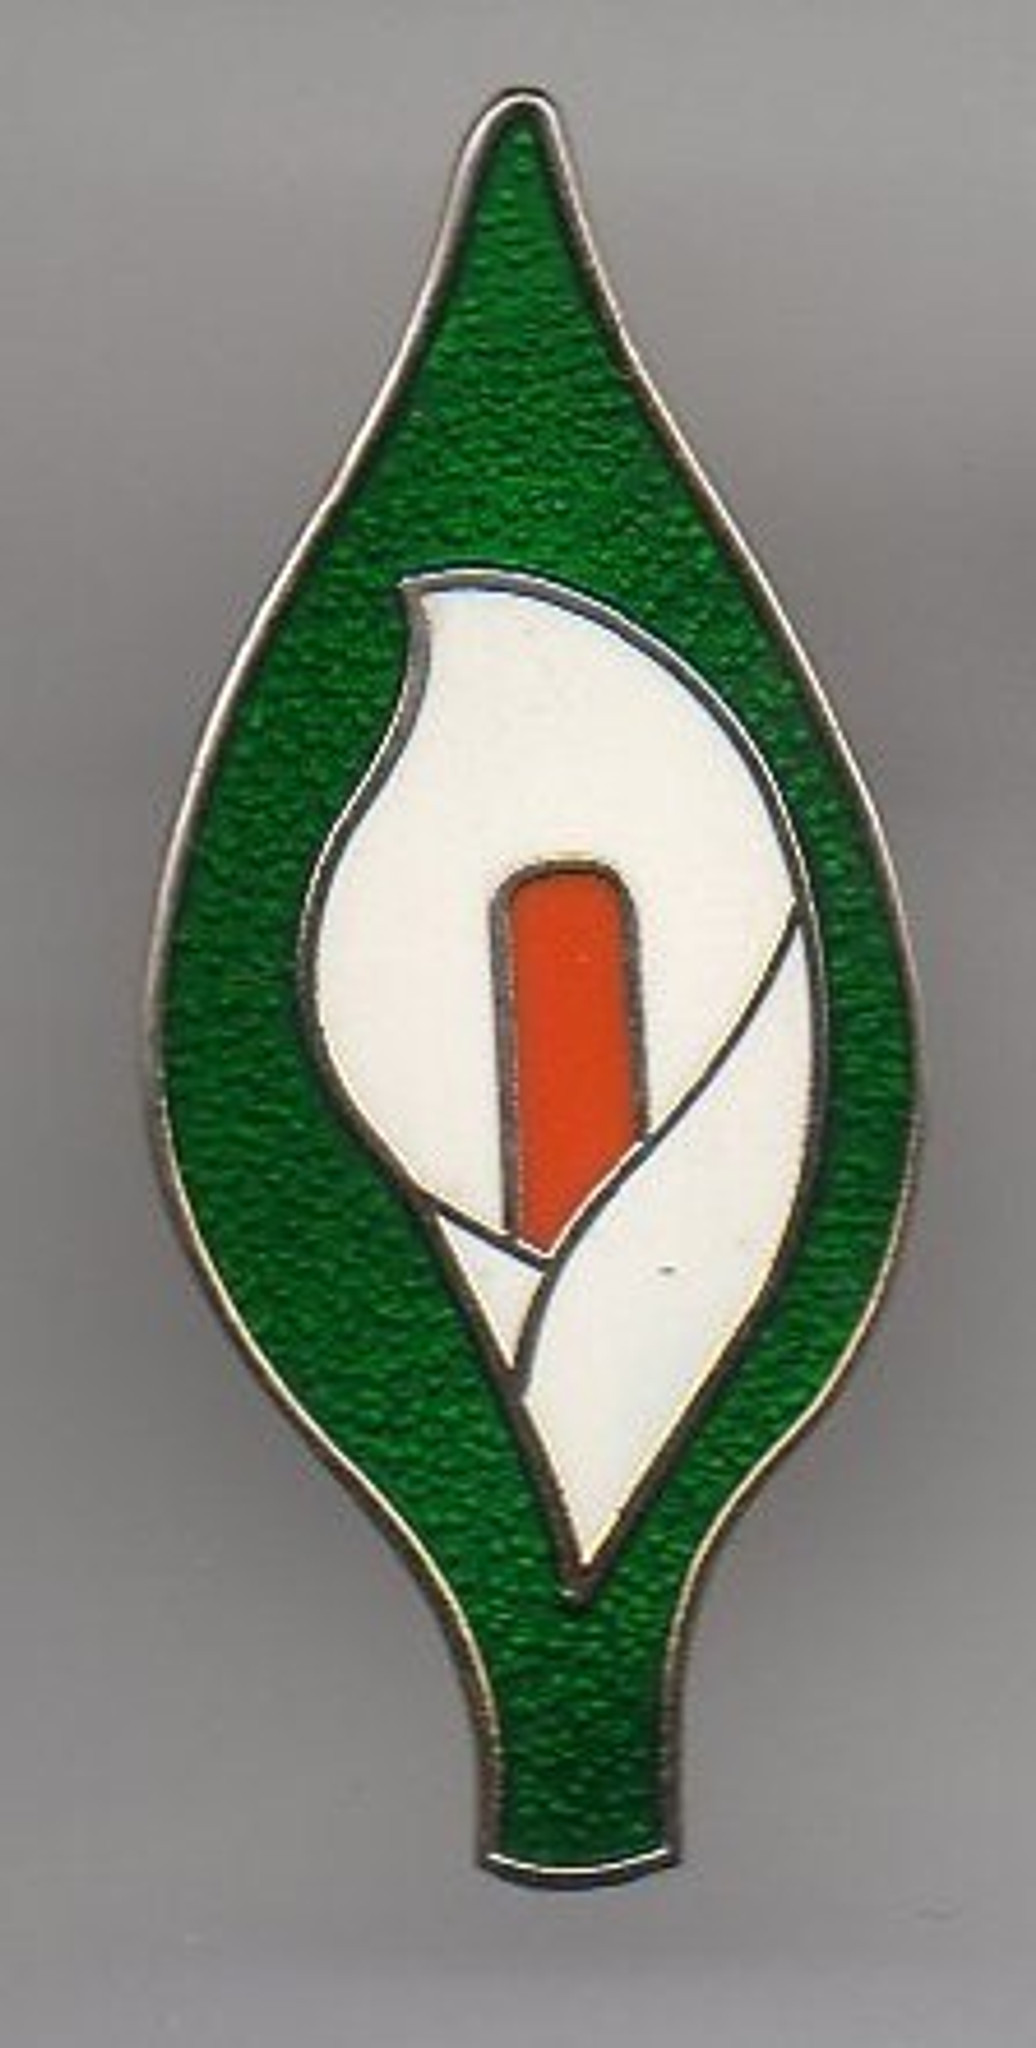 IRISH REPUBLICAN 1916 RISING REBEL 1916 EASTER LILY FLOWER ENAMEL PIN BADGE